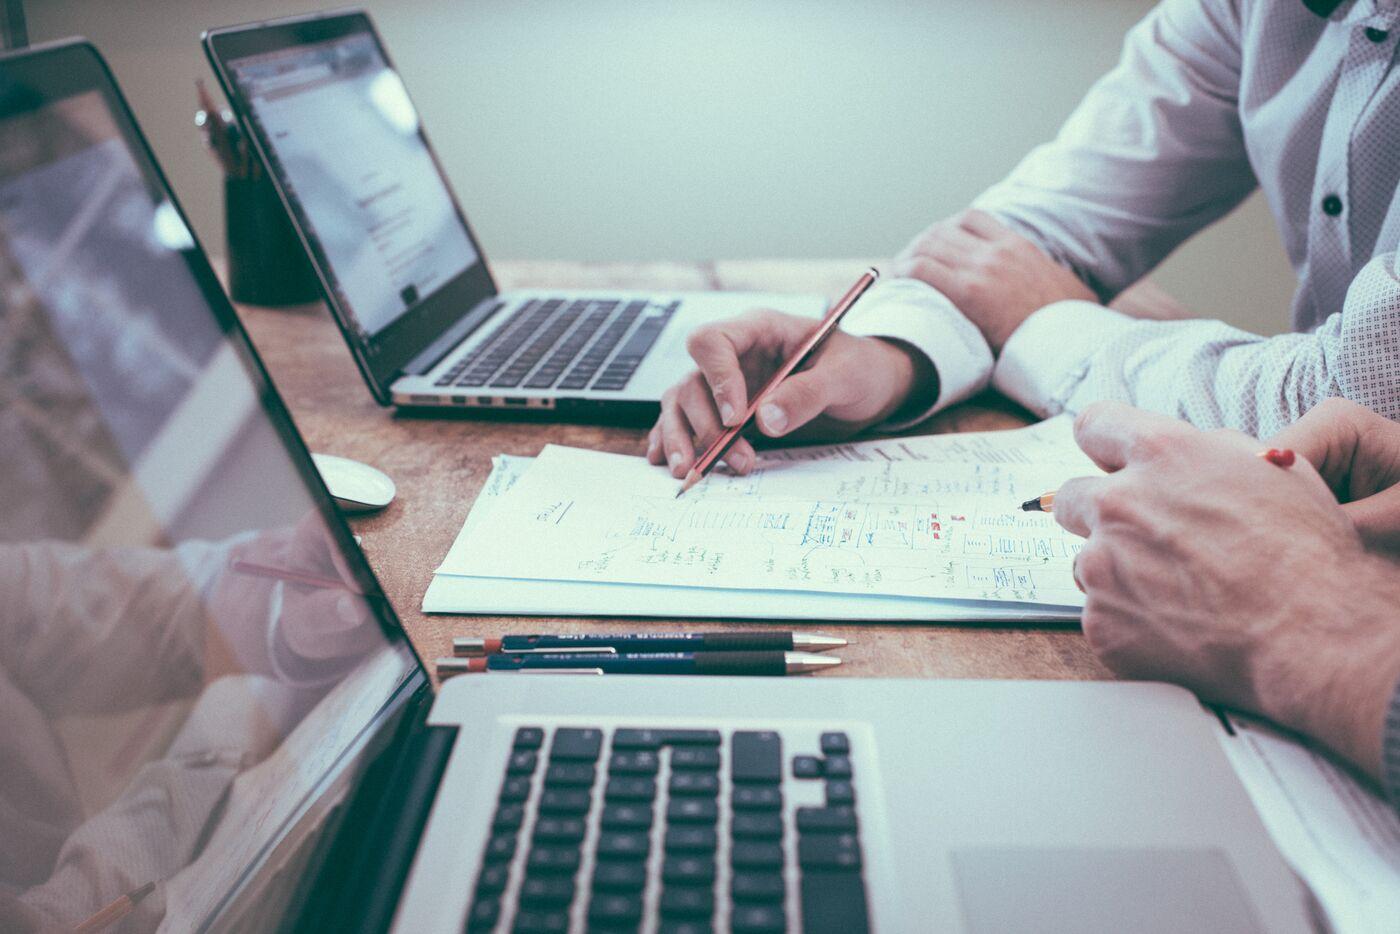 Sales Manager (m/w/d) - Job Freiburg - Karriere - Application form